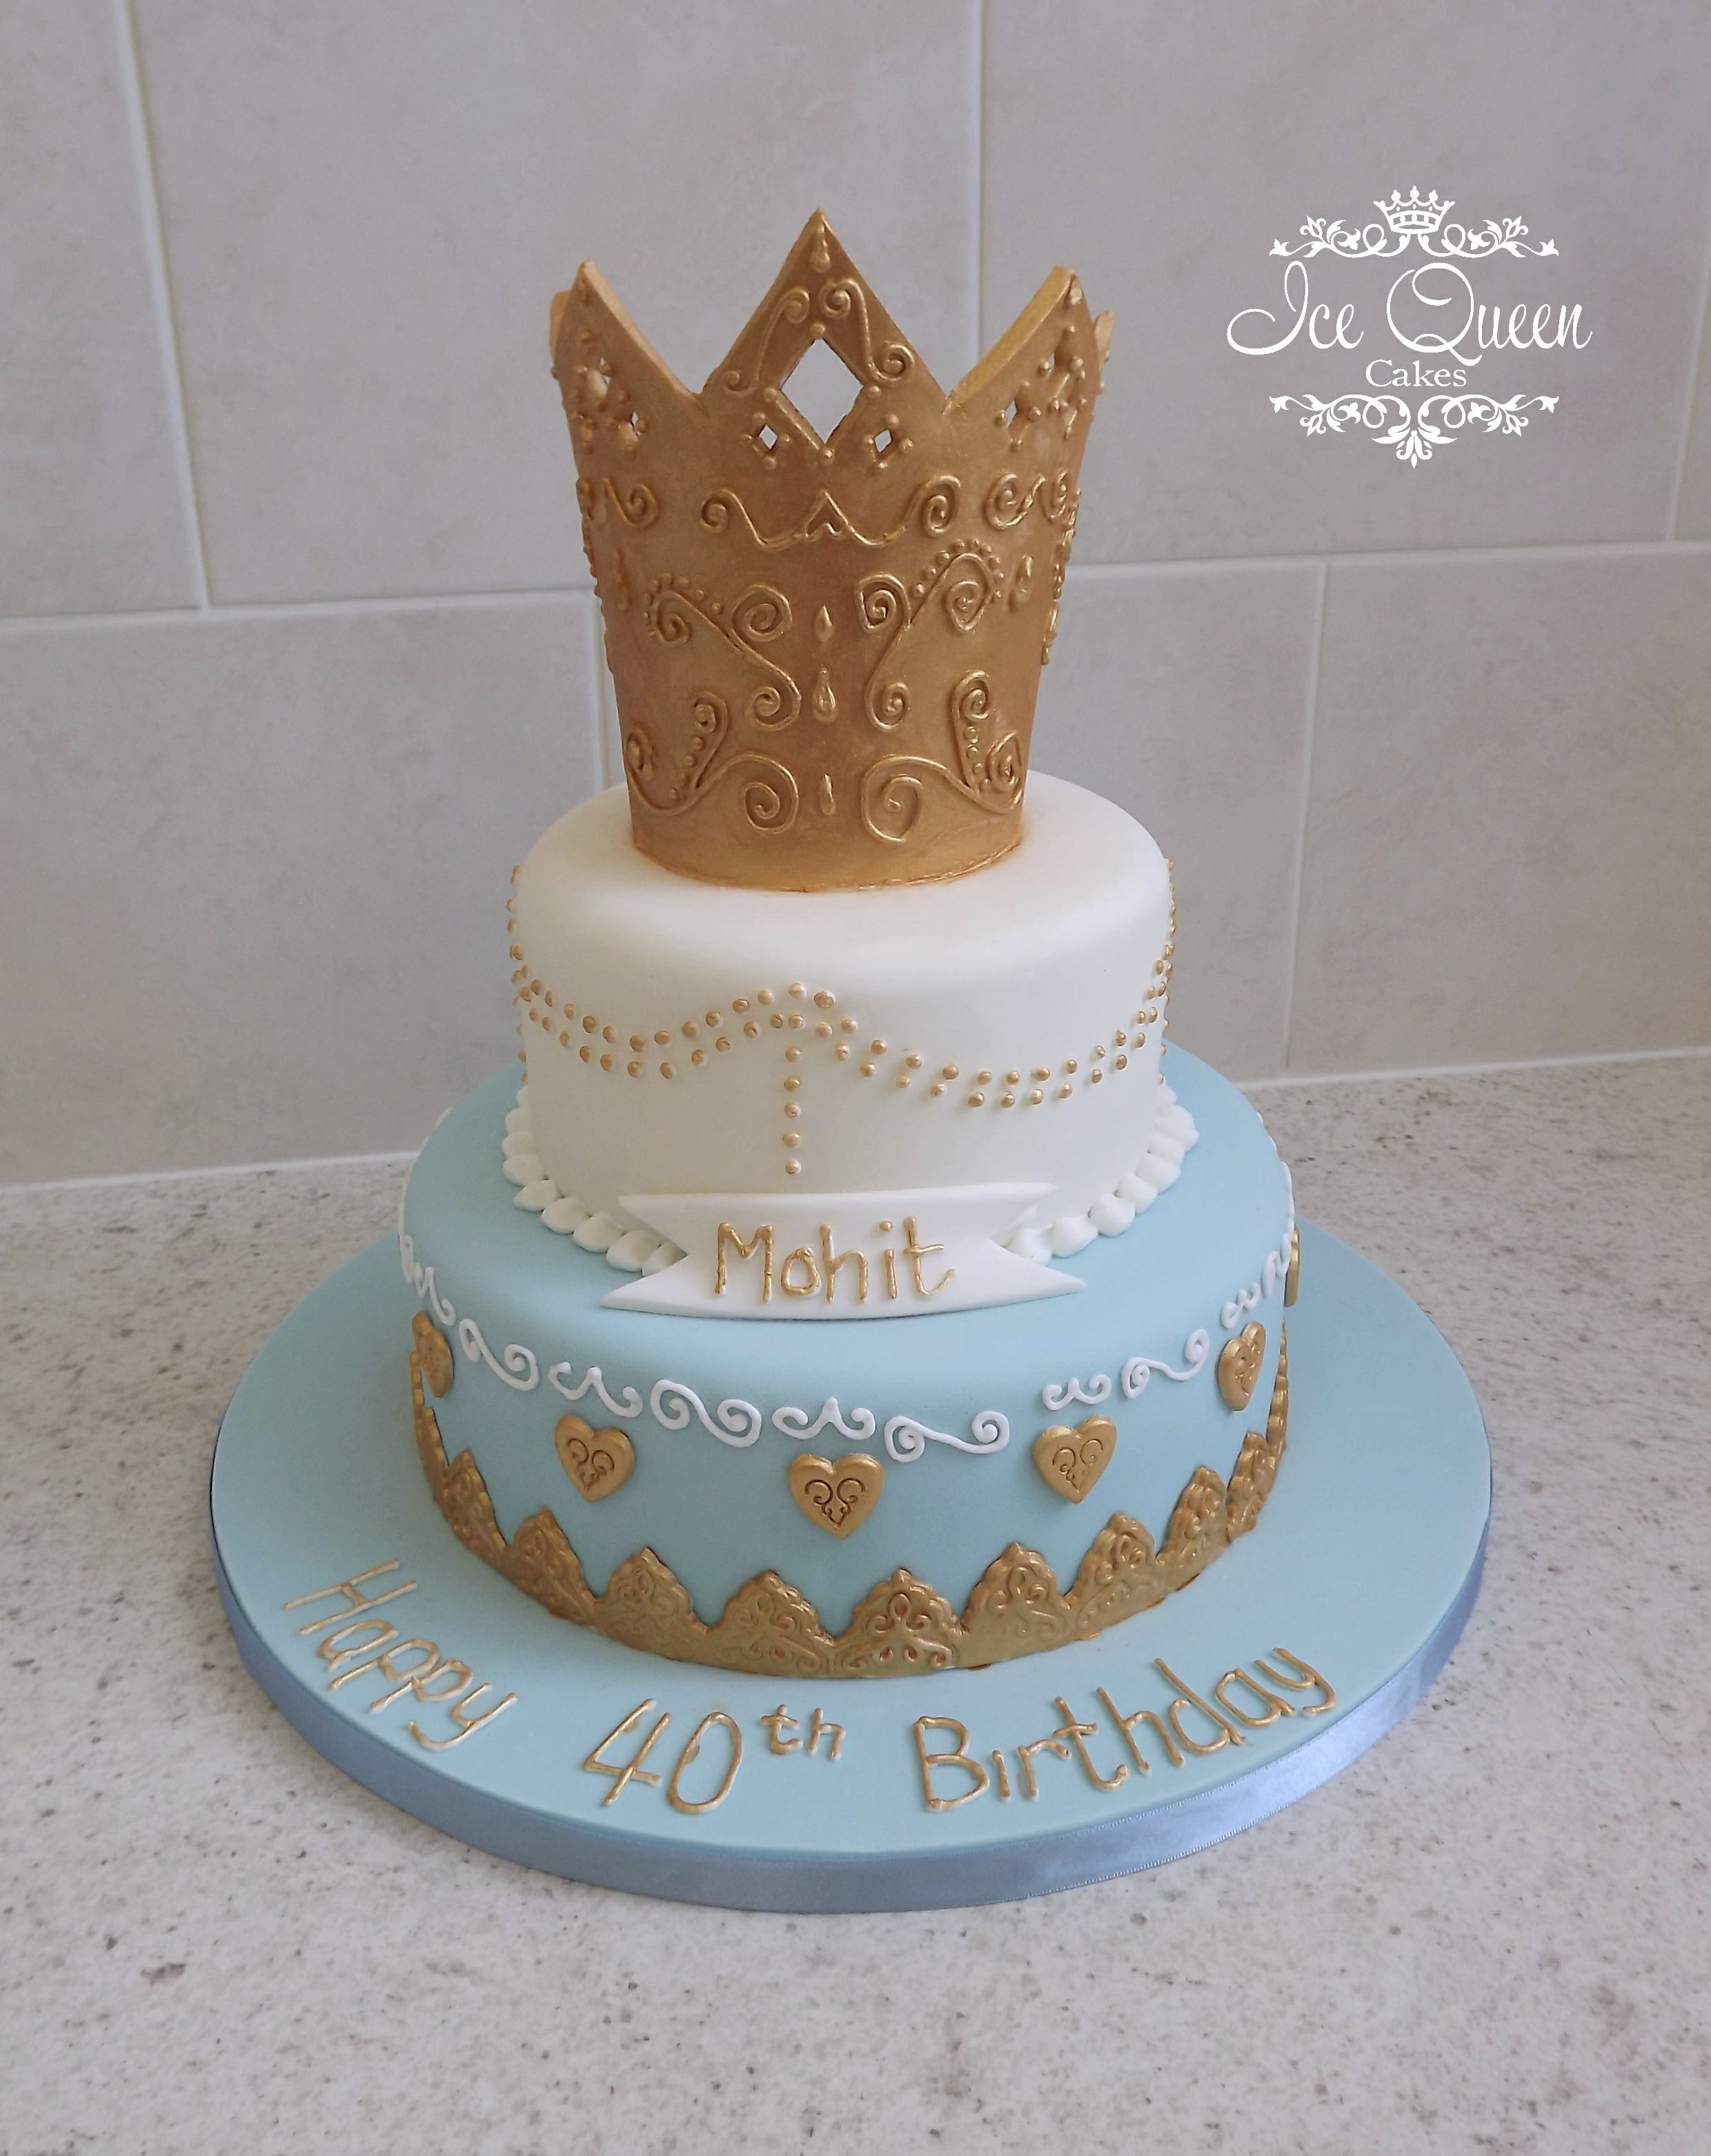 2 Tier And Crown Birthday Cake Ice Queen Cakes Designer Wedding - Wedding Cakes Wigan